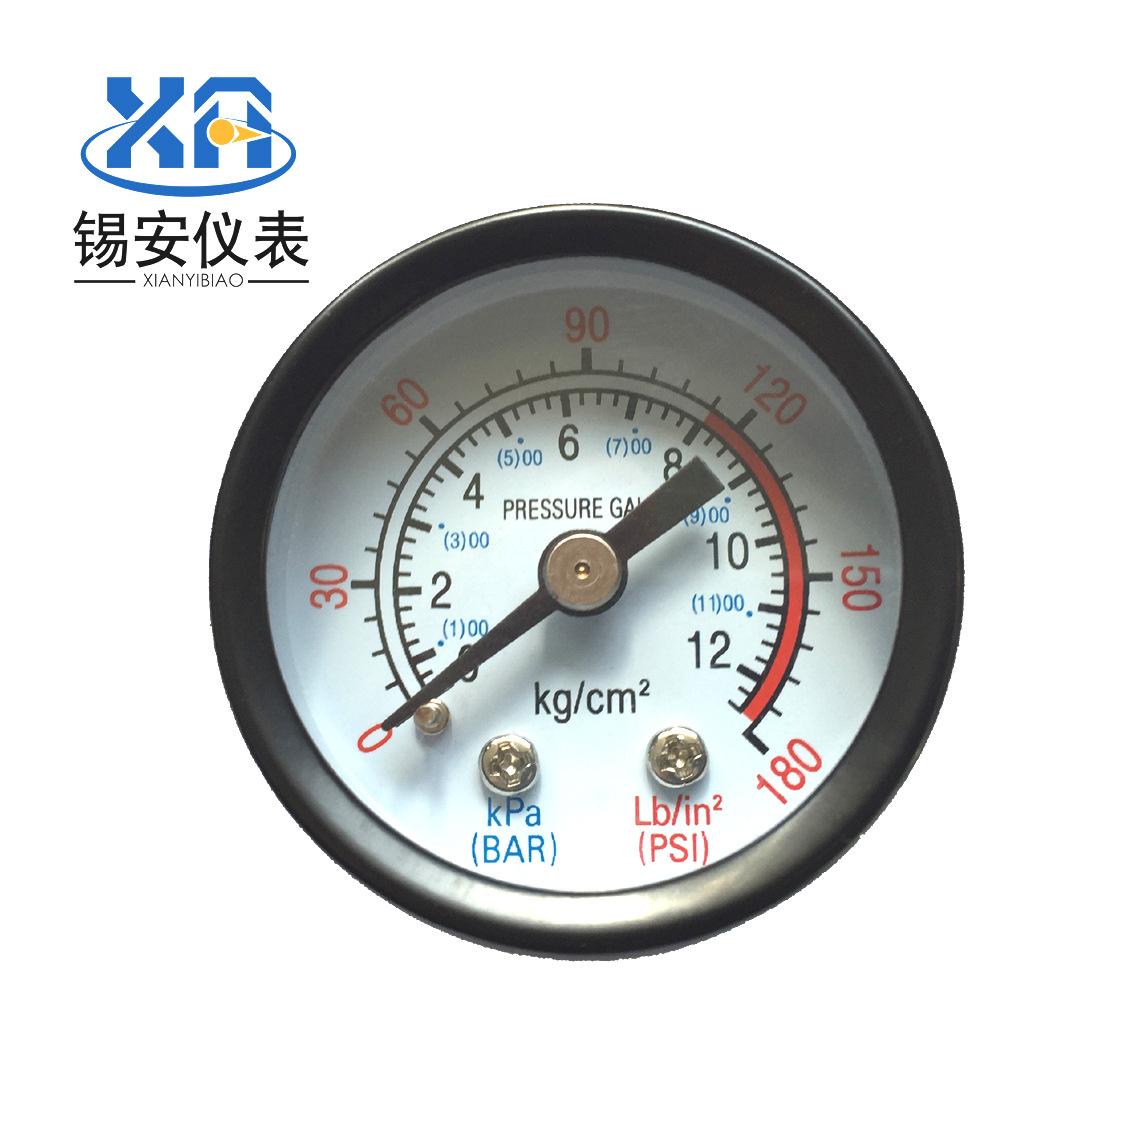 Y40 pressure gauge instrument air compressor accessories axial gauge barometer upgrade 12bar